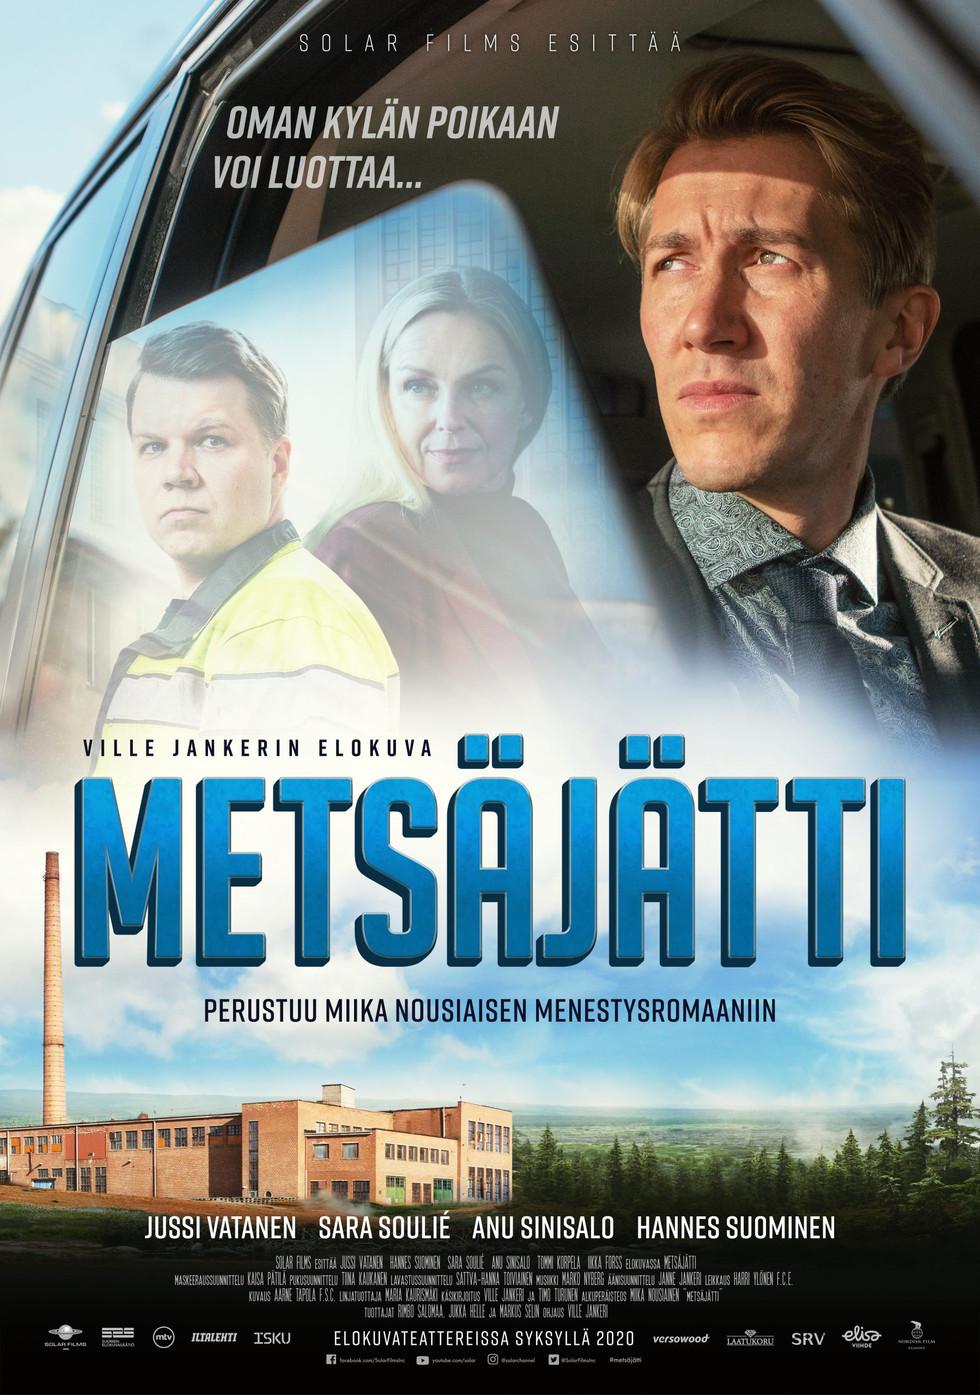 metsajatti_posterfinal_large-scaled.jpg